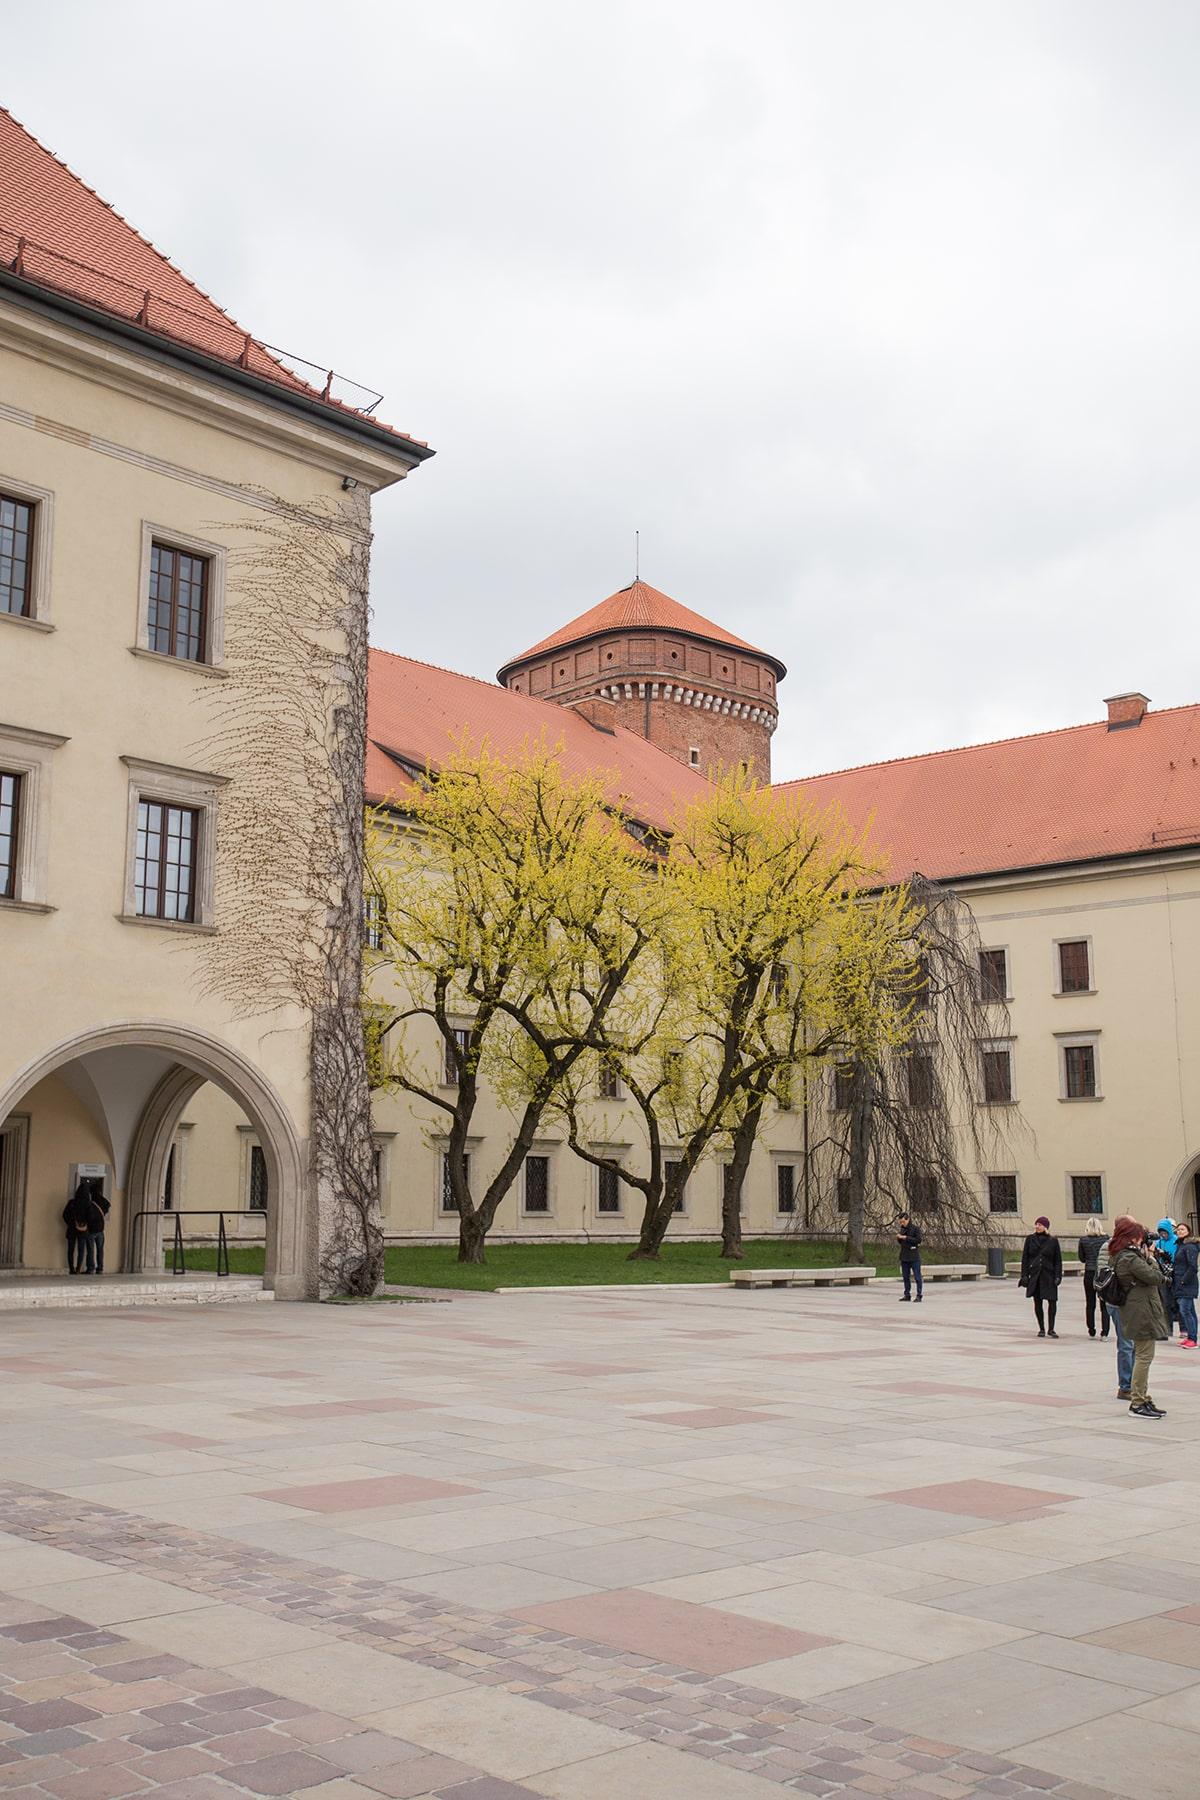 Wawel Castle Krakow- such a beautiful place to visit